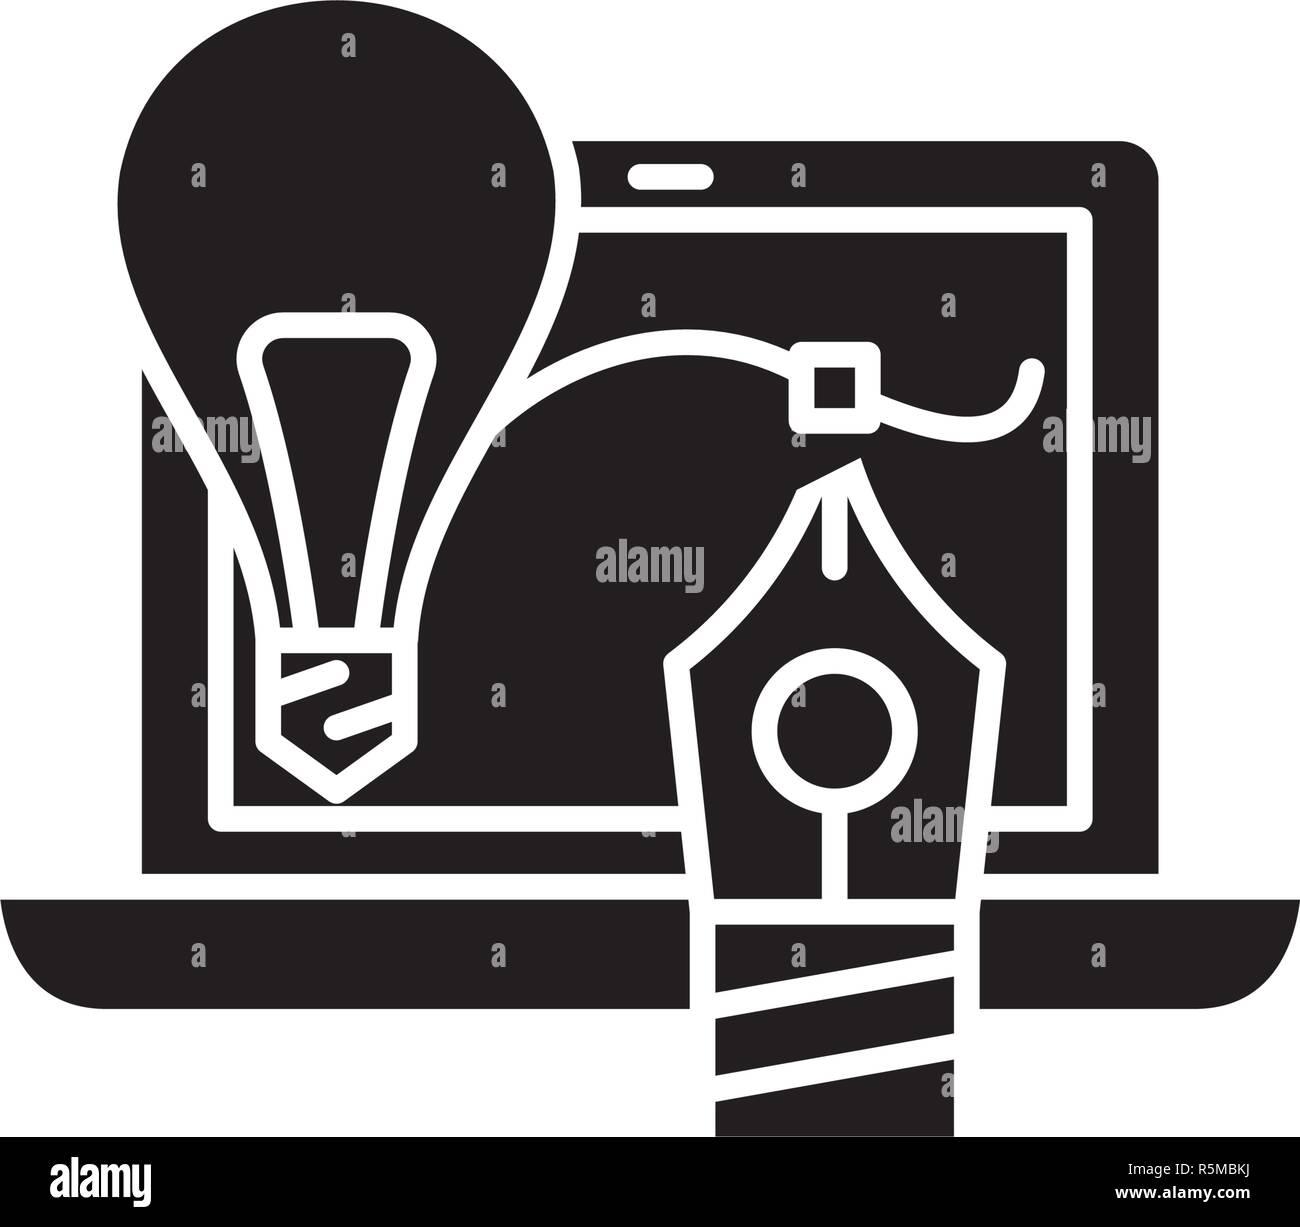 Creativity black icon, vector sign on isolated background. Creativity concept symbol, illustration  - Stock Image